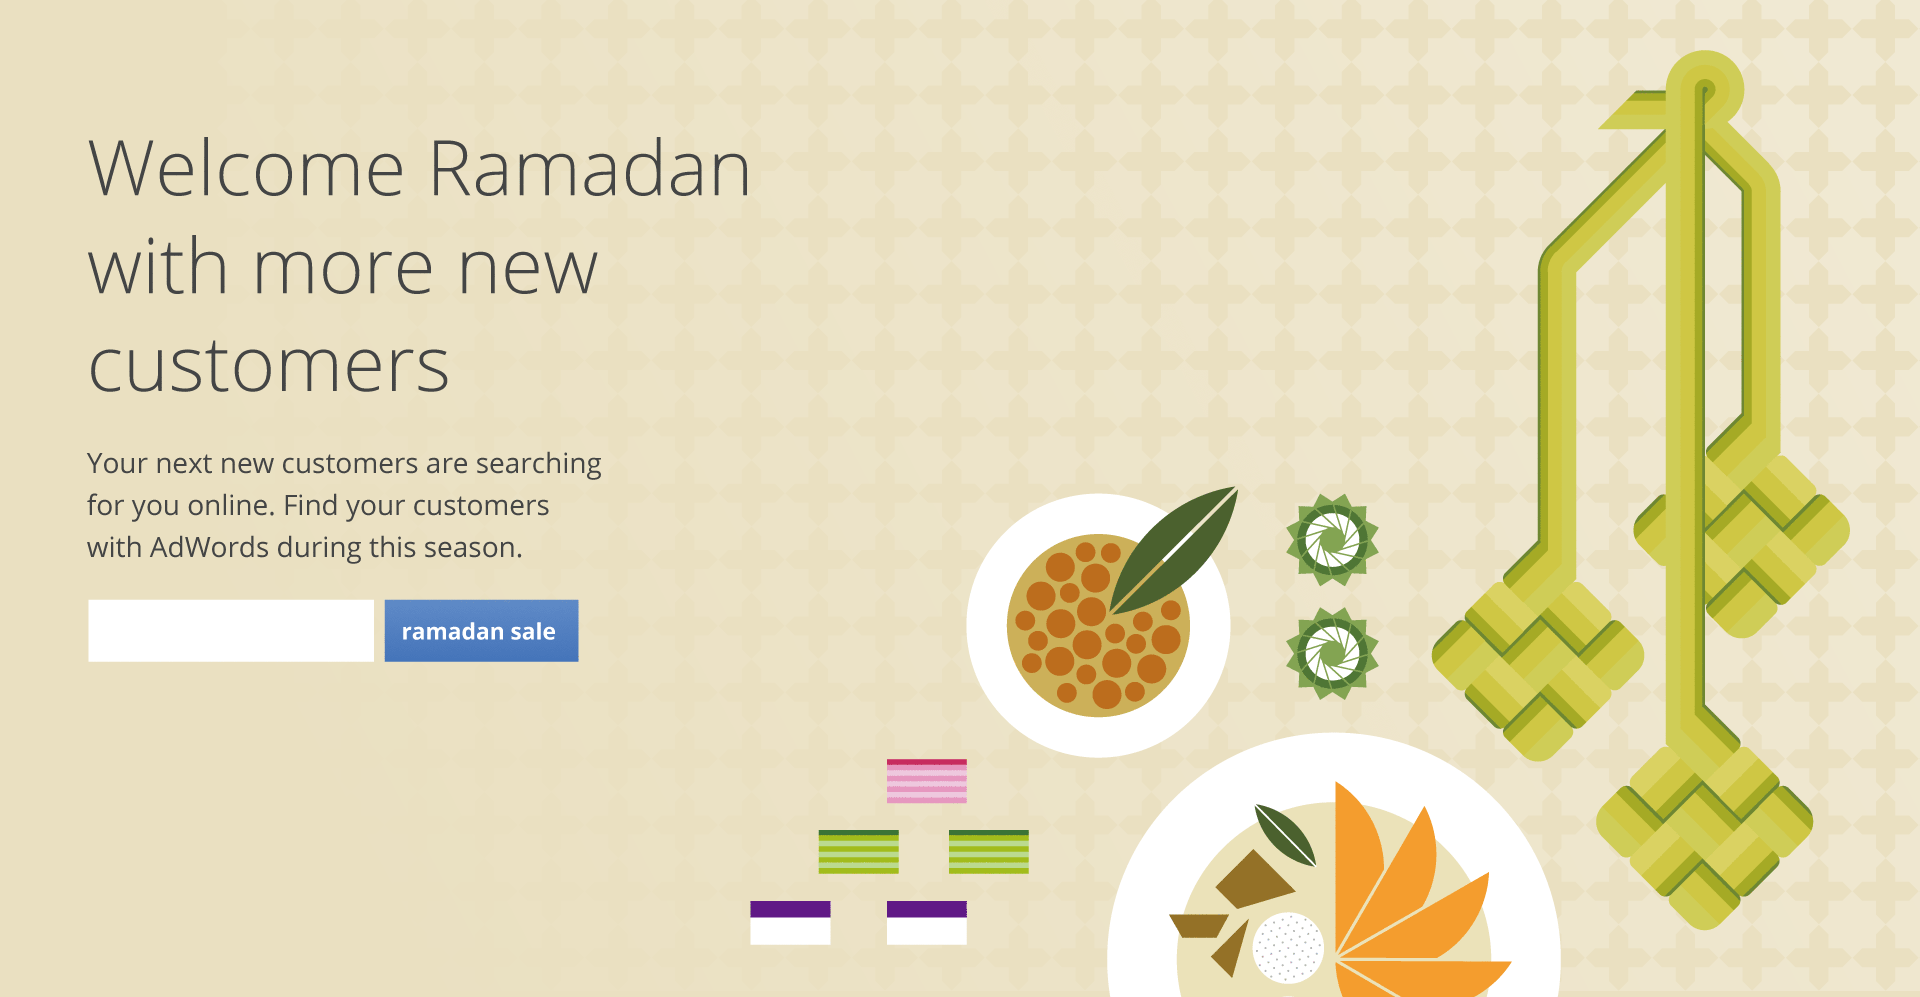 Google Adwords Ramadan Illustrations